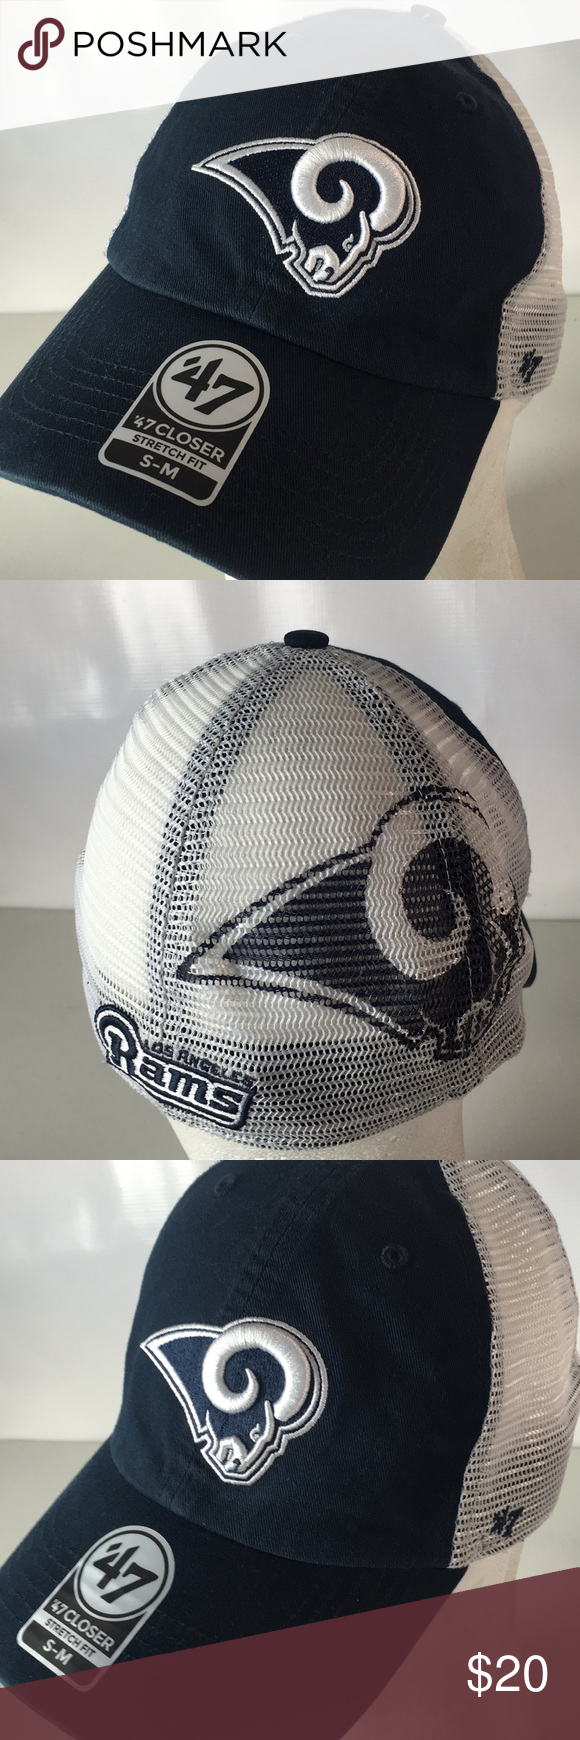 Los Angeles Rams Hat Mesh Big Logo Spellout Sz S/M